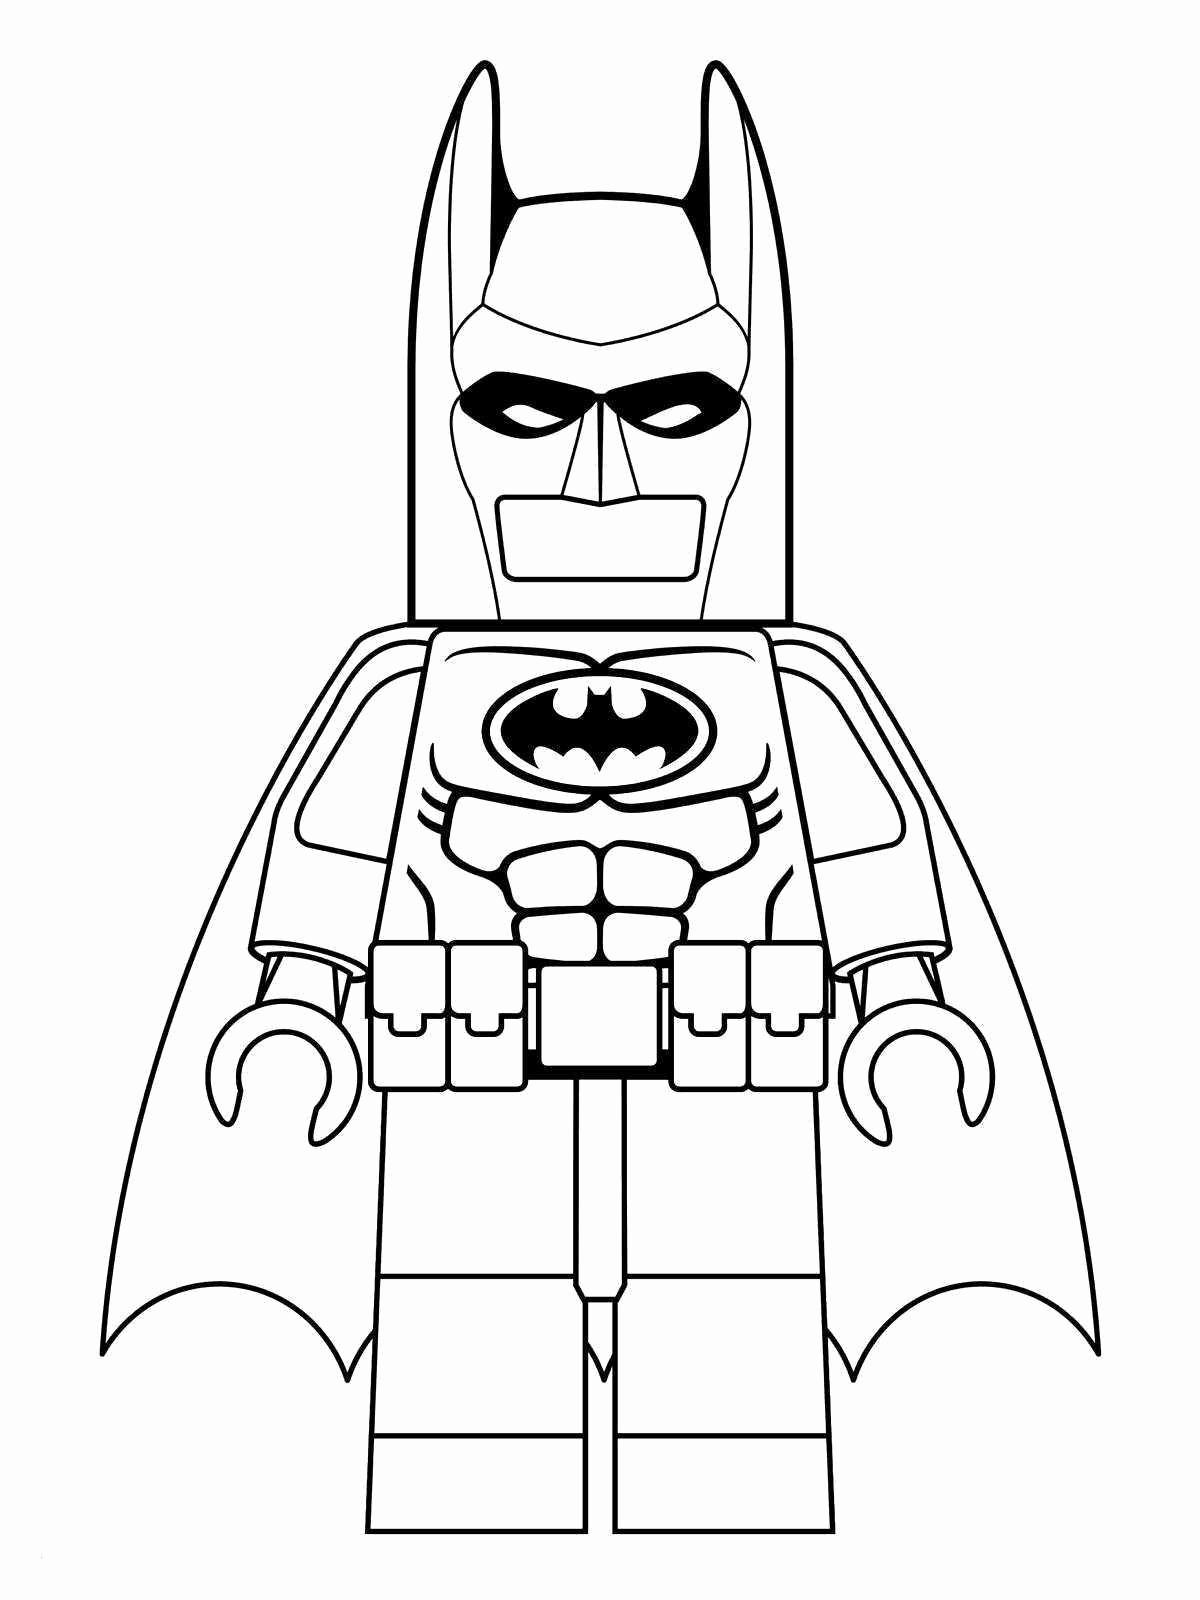 De Coloriages: Coloriage De Lego Batman concernant Arlequin A Colorier